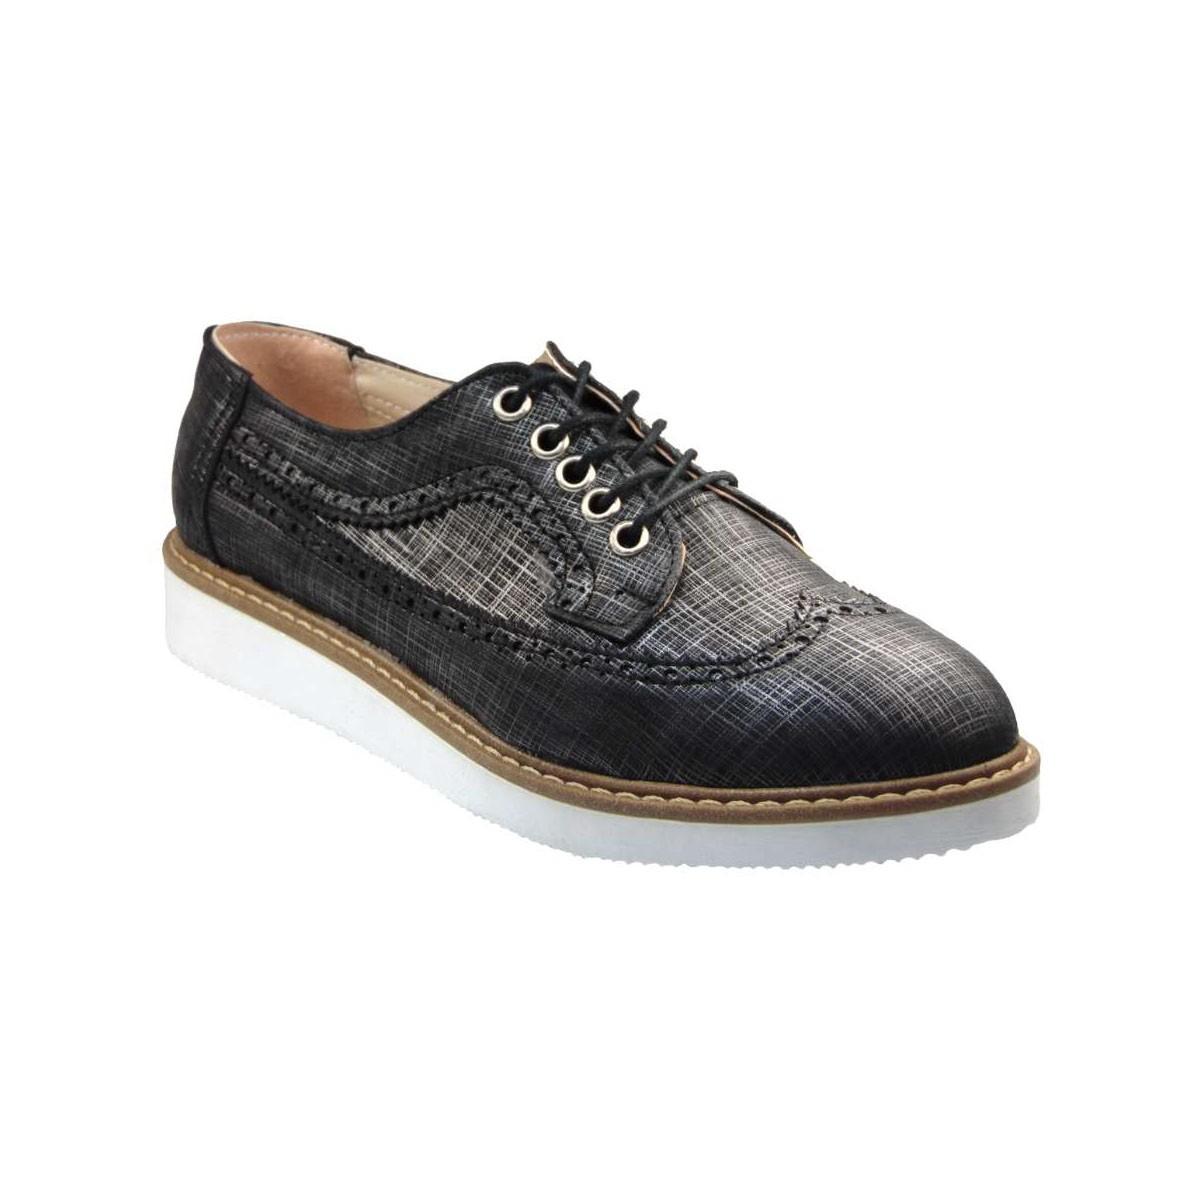 Tsimpolis Shoes 691 Oxford Απο Συνθετικό Δέρμα Μαύρο  86bc7d90274